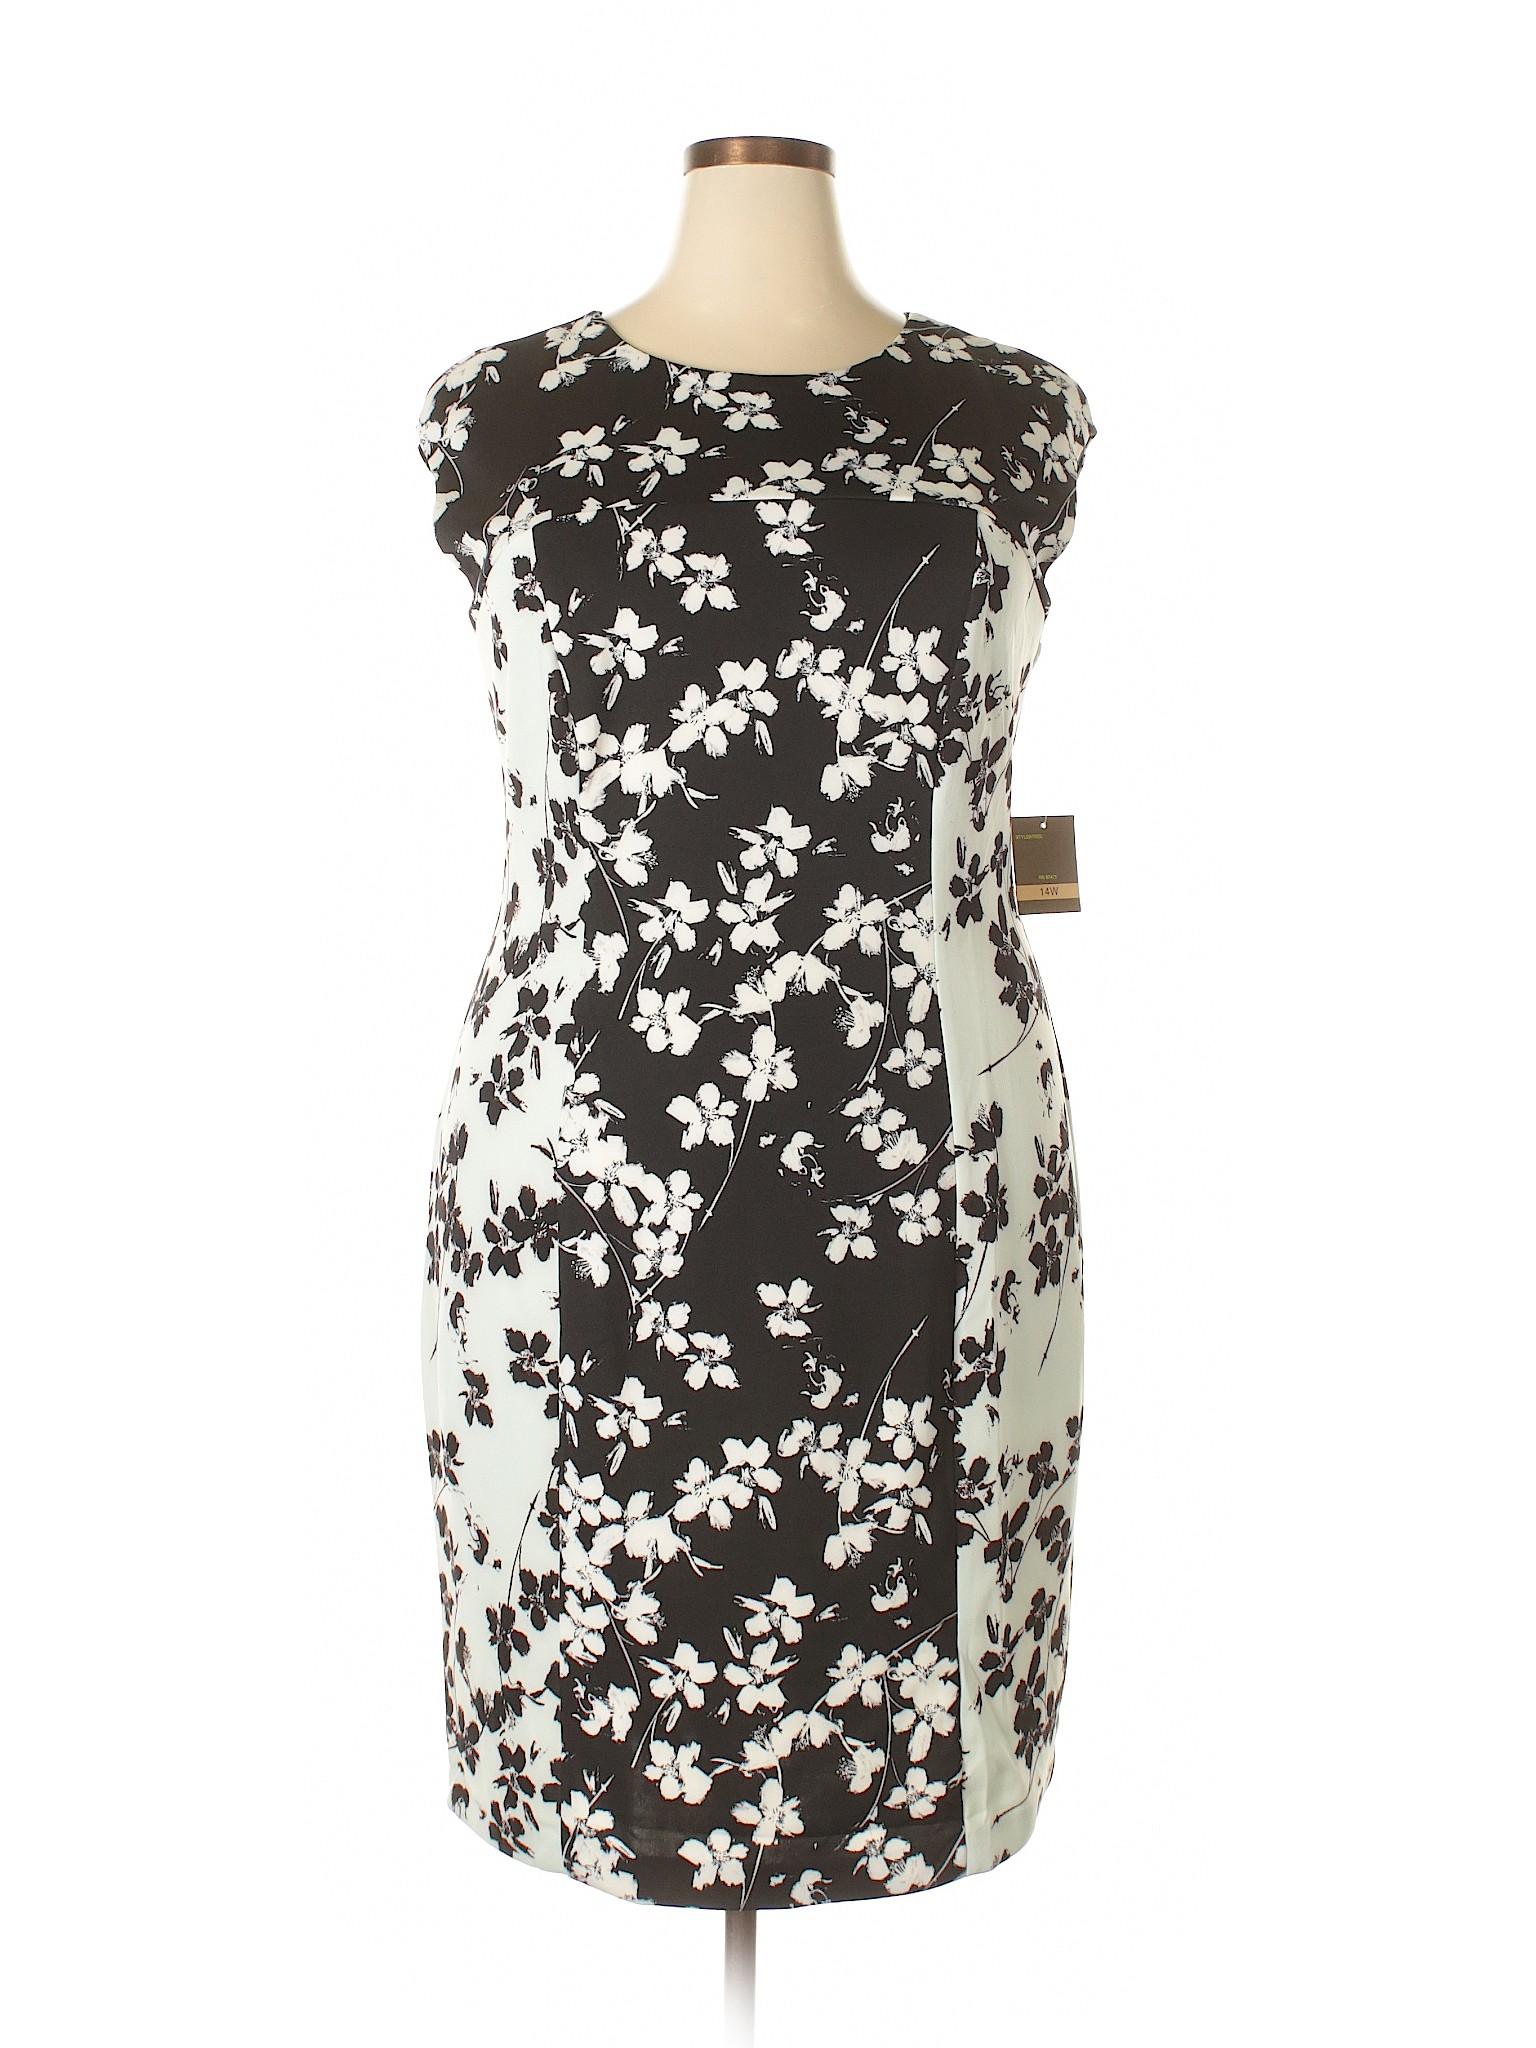 Dress Taylor Dress Casual Casual Taylor Boutique Dress winter winter Boutique winter Taylor Casual Boutique COqcA